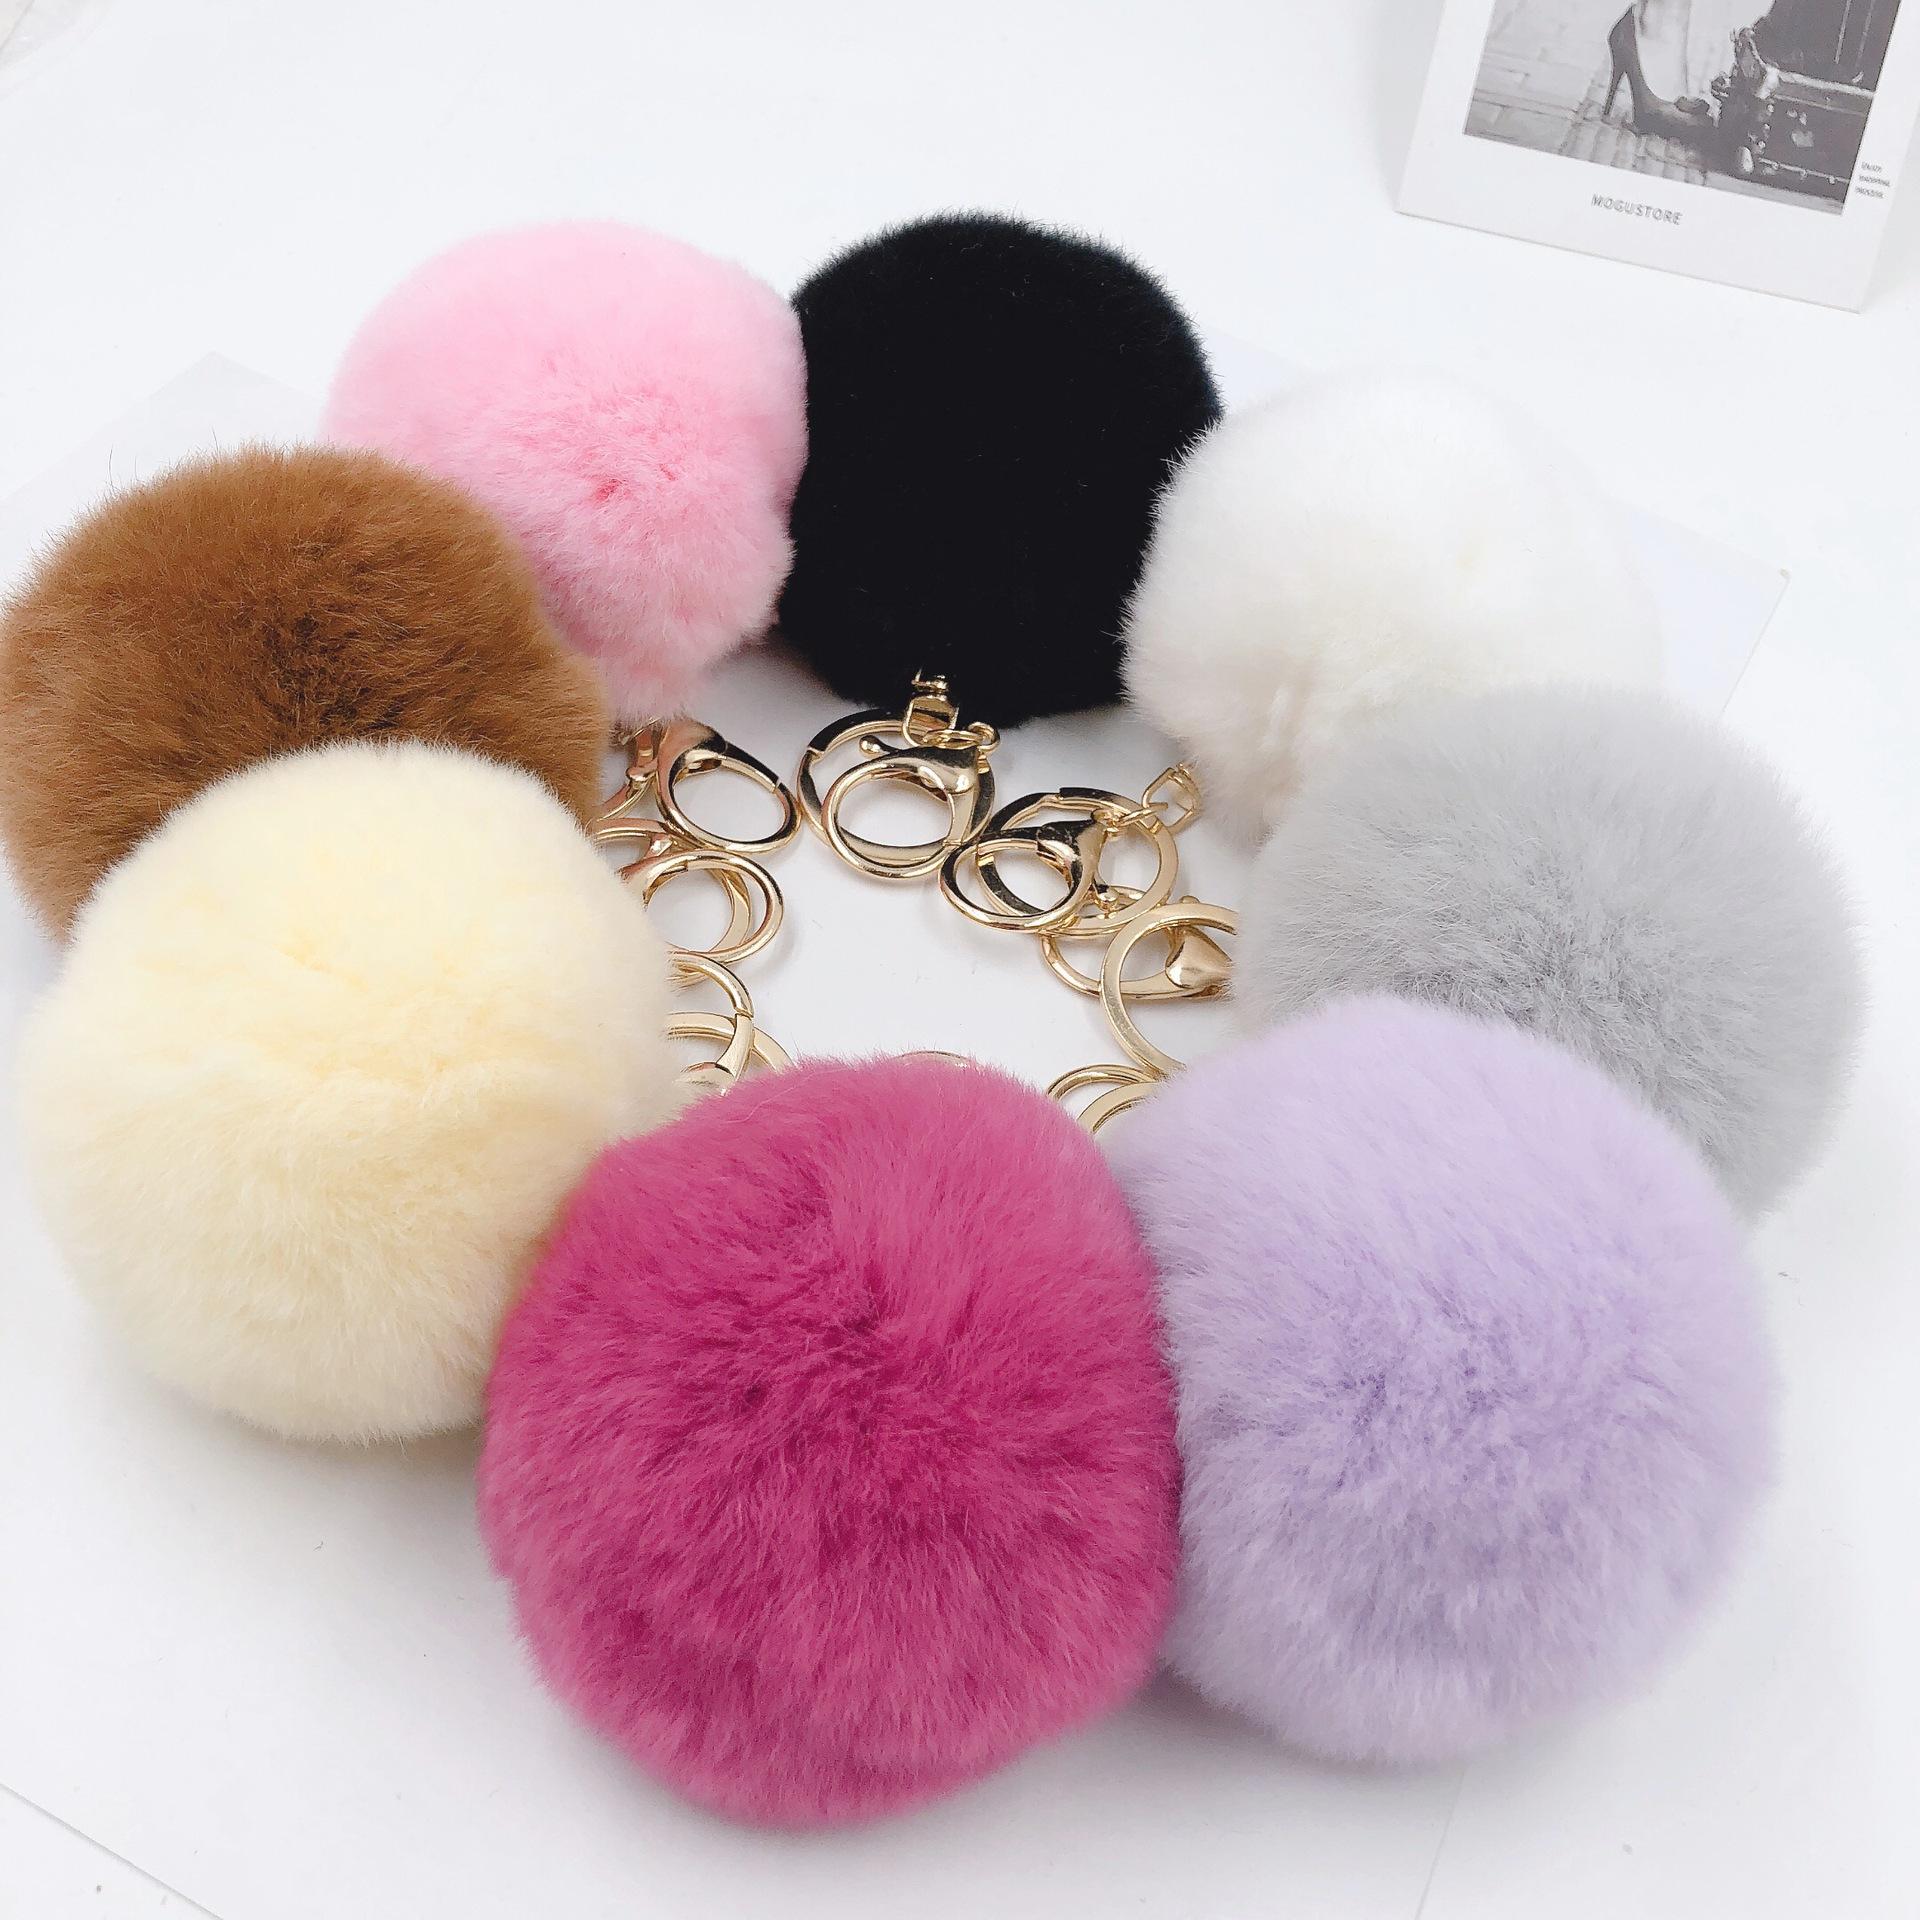 1pcs 8cm Fake Fur Brand Bag Keychain Pompom Car Keyring Gold Color Chains Pompons Fake Fox Rabbit Fur Charms Chain